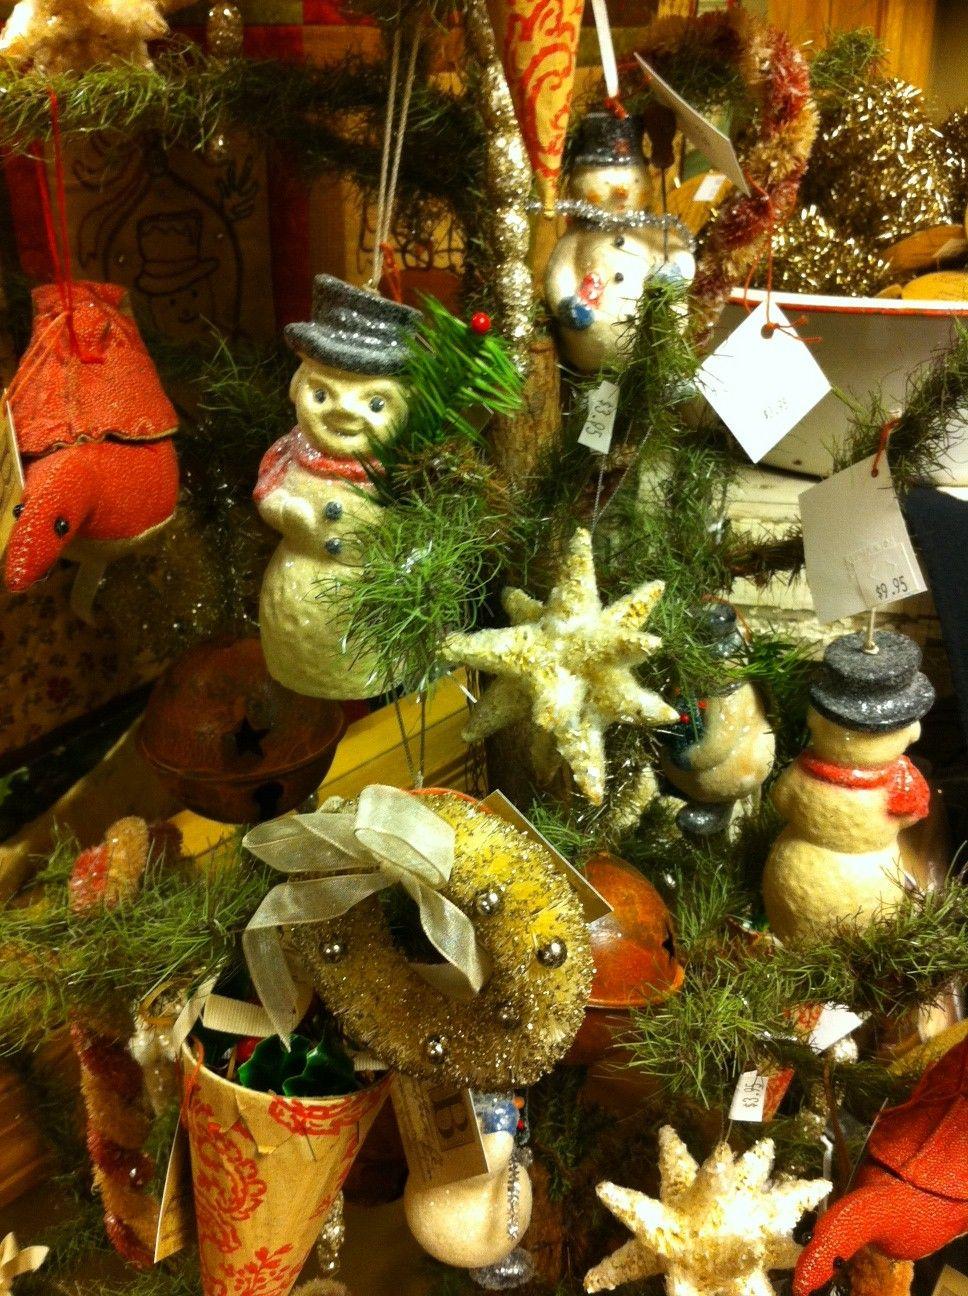 love the wreath ornament